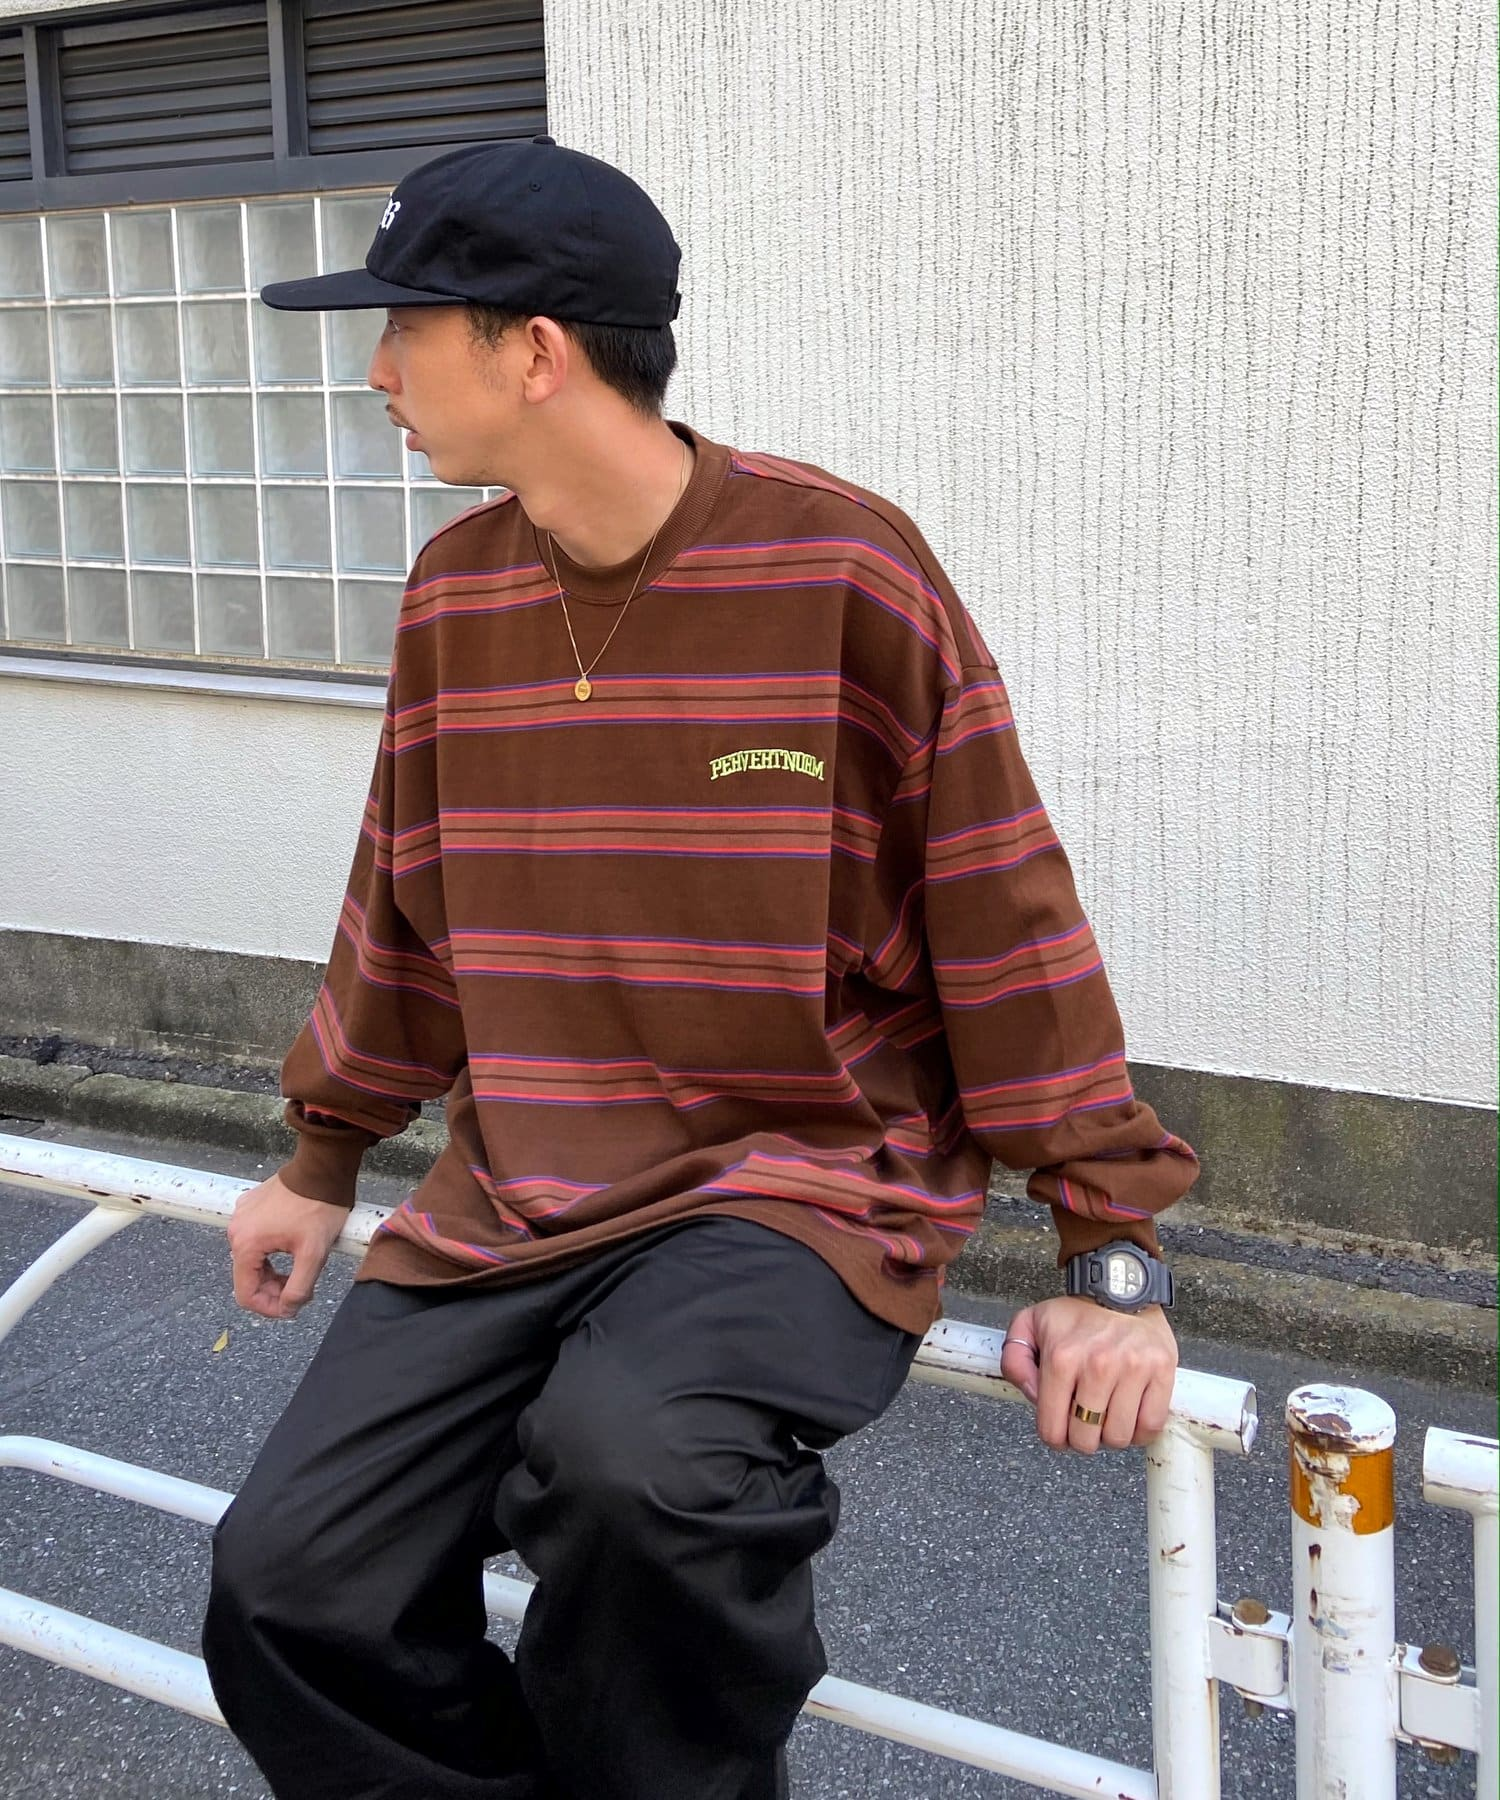 WHO'S WHO gallery(フーズフーギャラリー) 【KOOKY'N/クーキー】マルチボーダーロンT